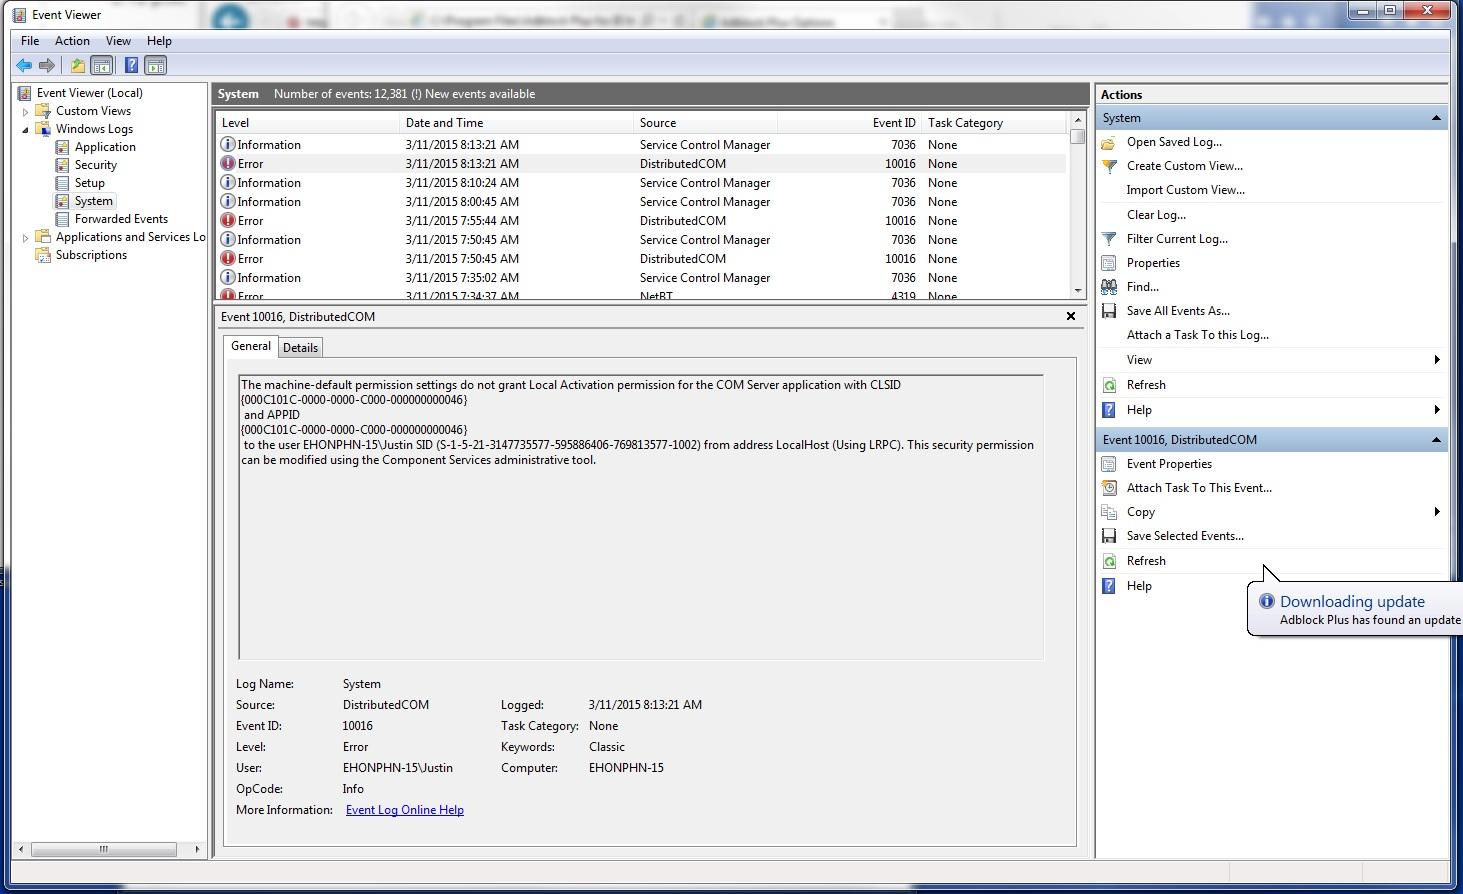 2125 (Permissions error updating ABP IE: The machine-default